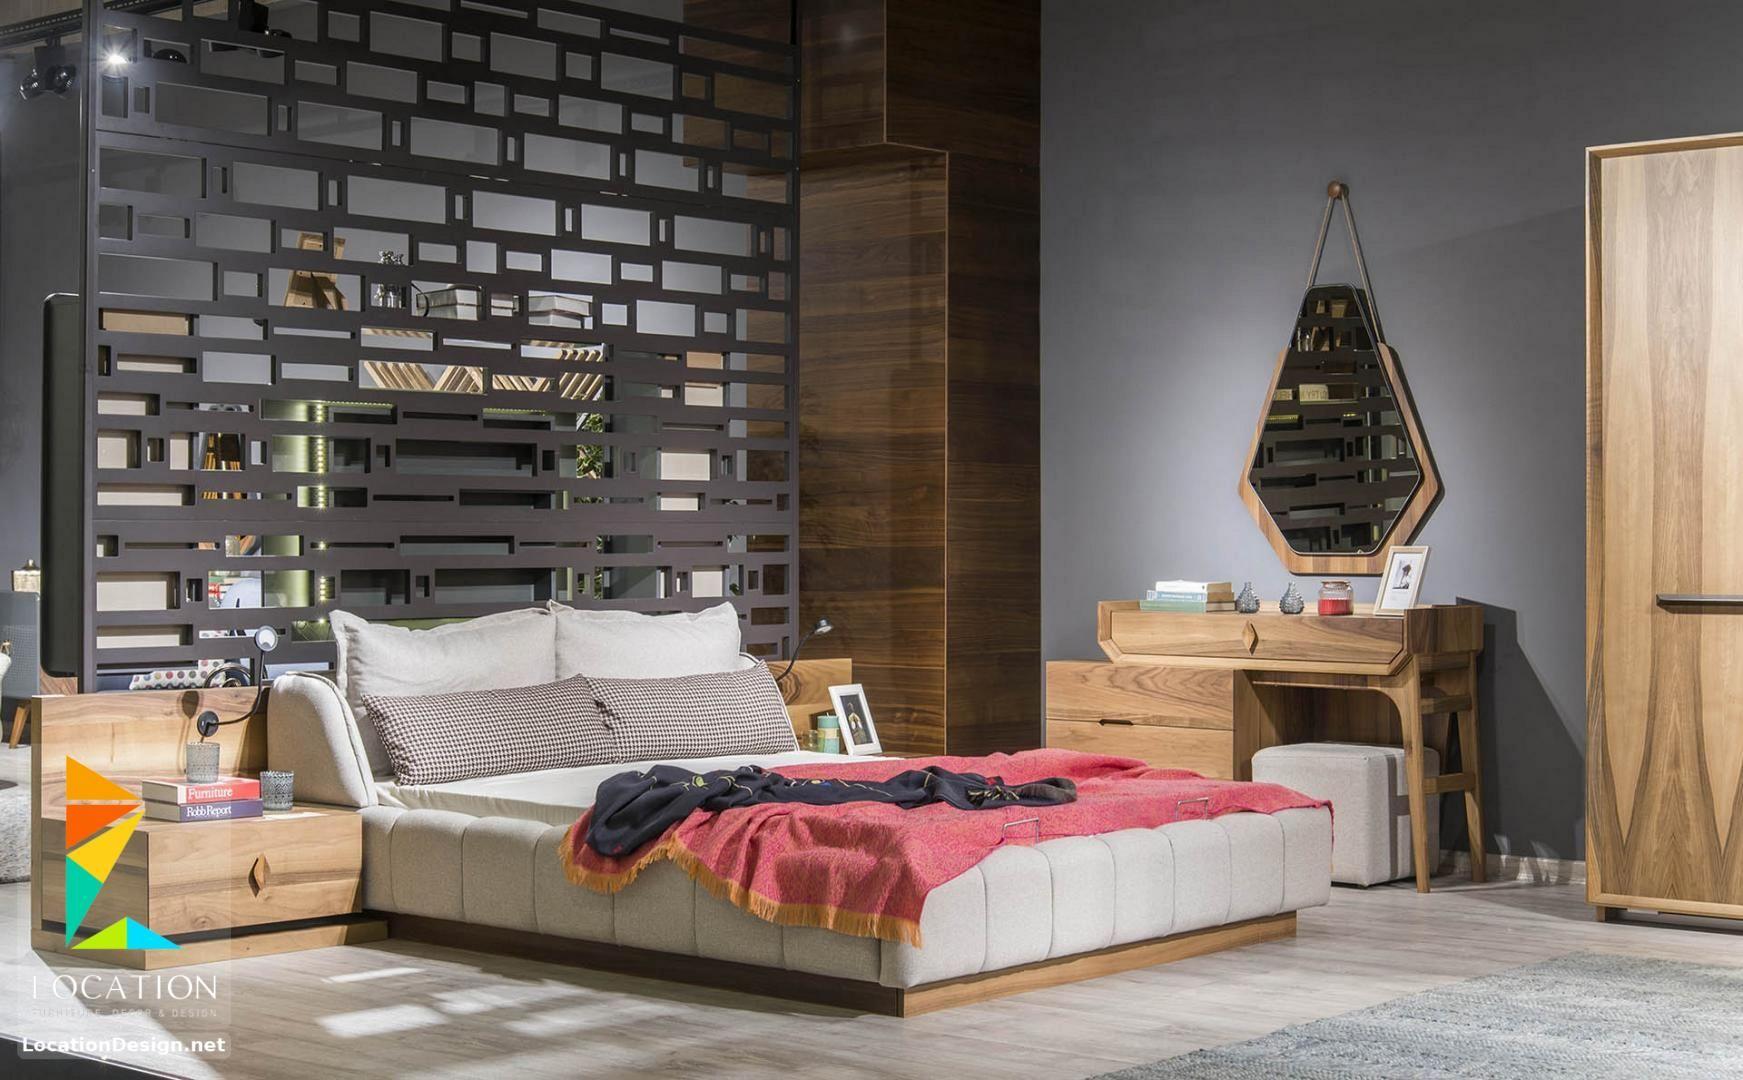 احدث موديلات و اشكال غرف نوم تركي 2019 2020 Sleeping Room Furniture Home Decor